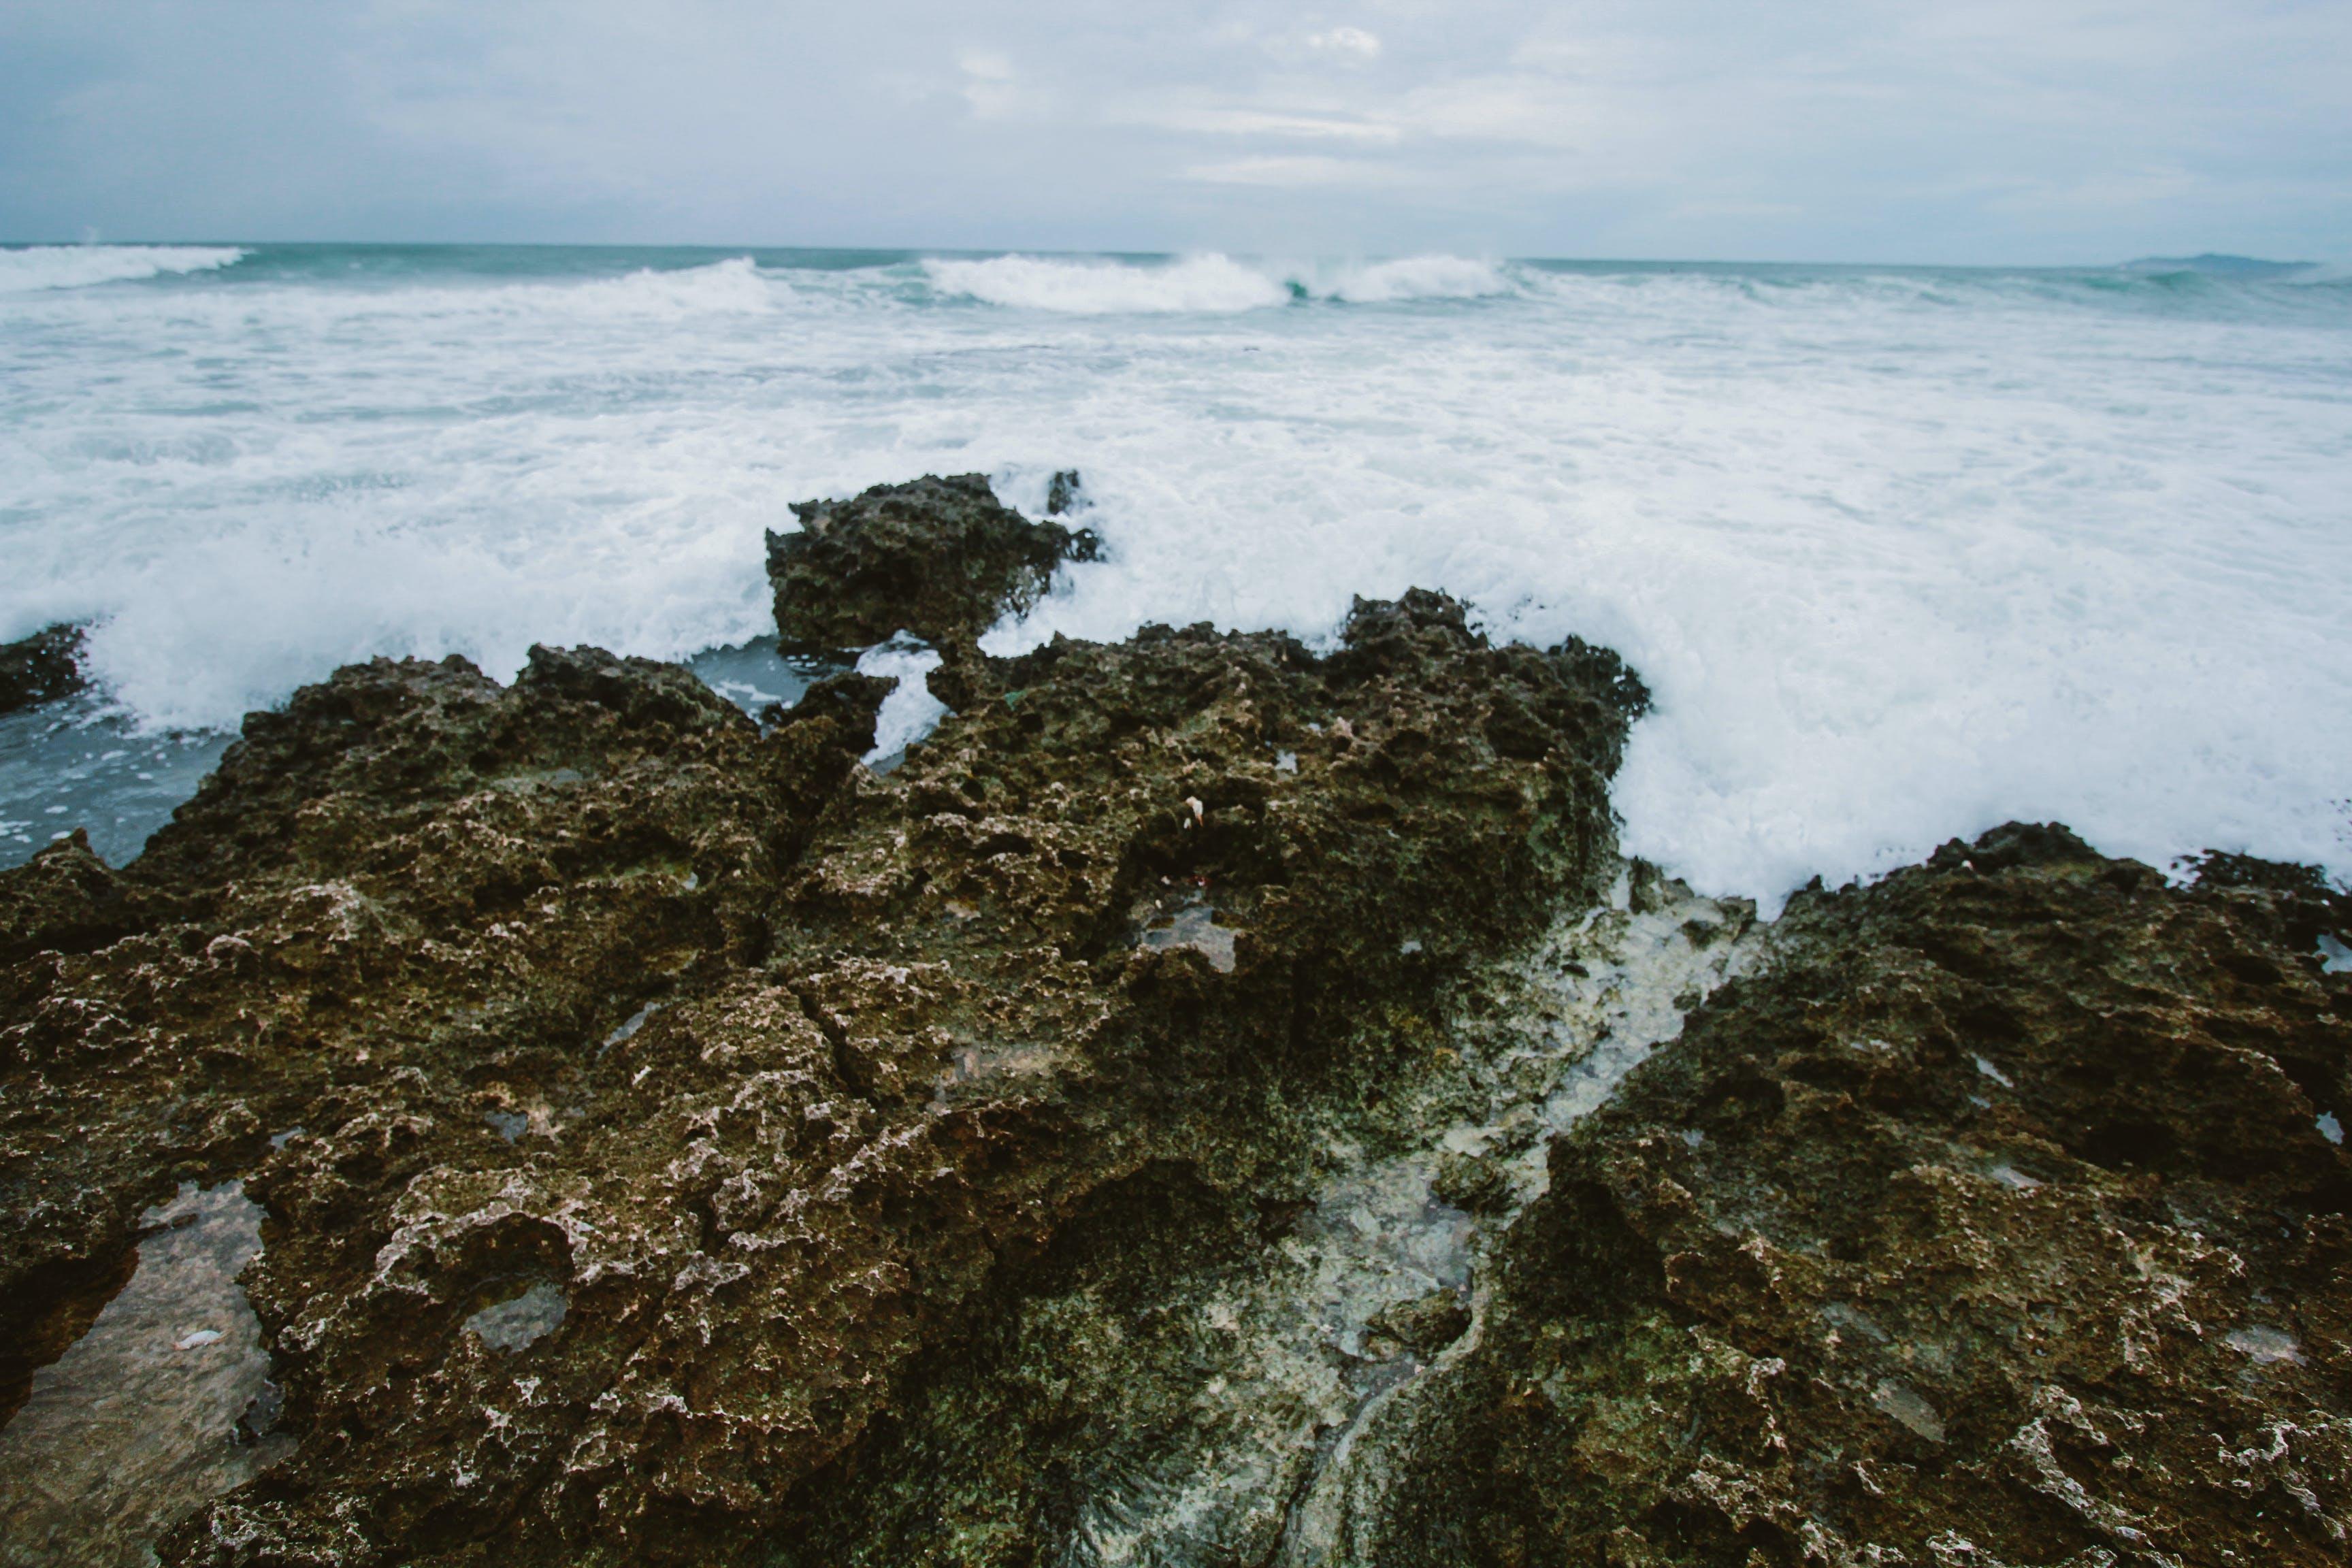 Gray Stone Near Body of Water